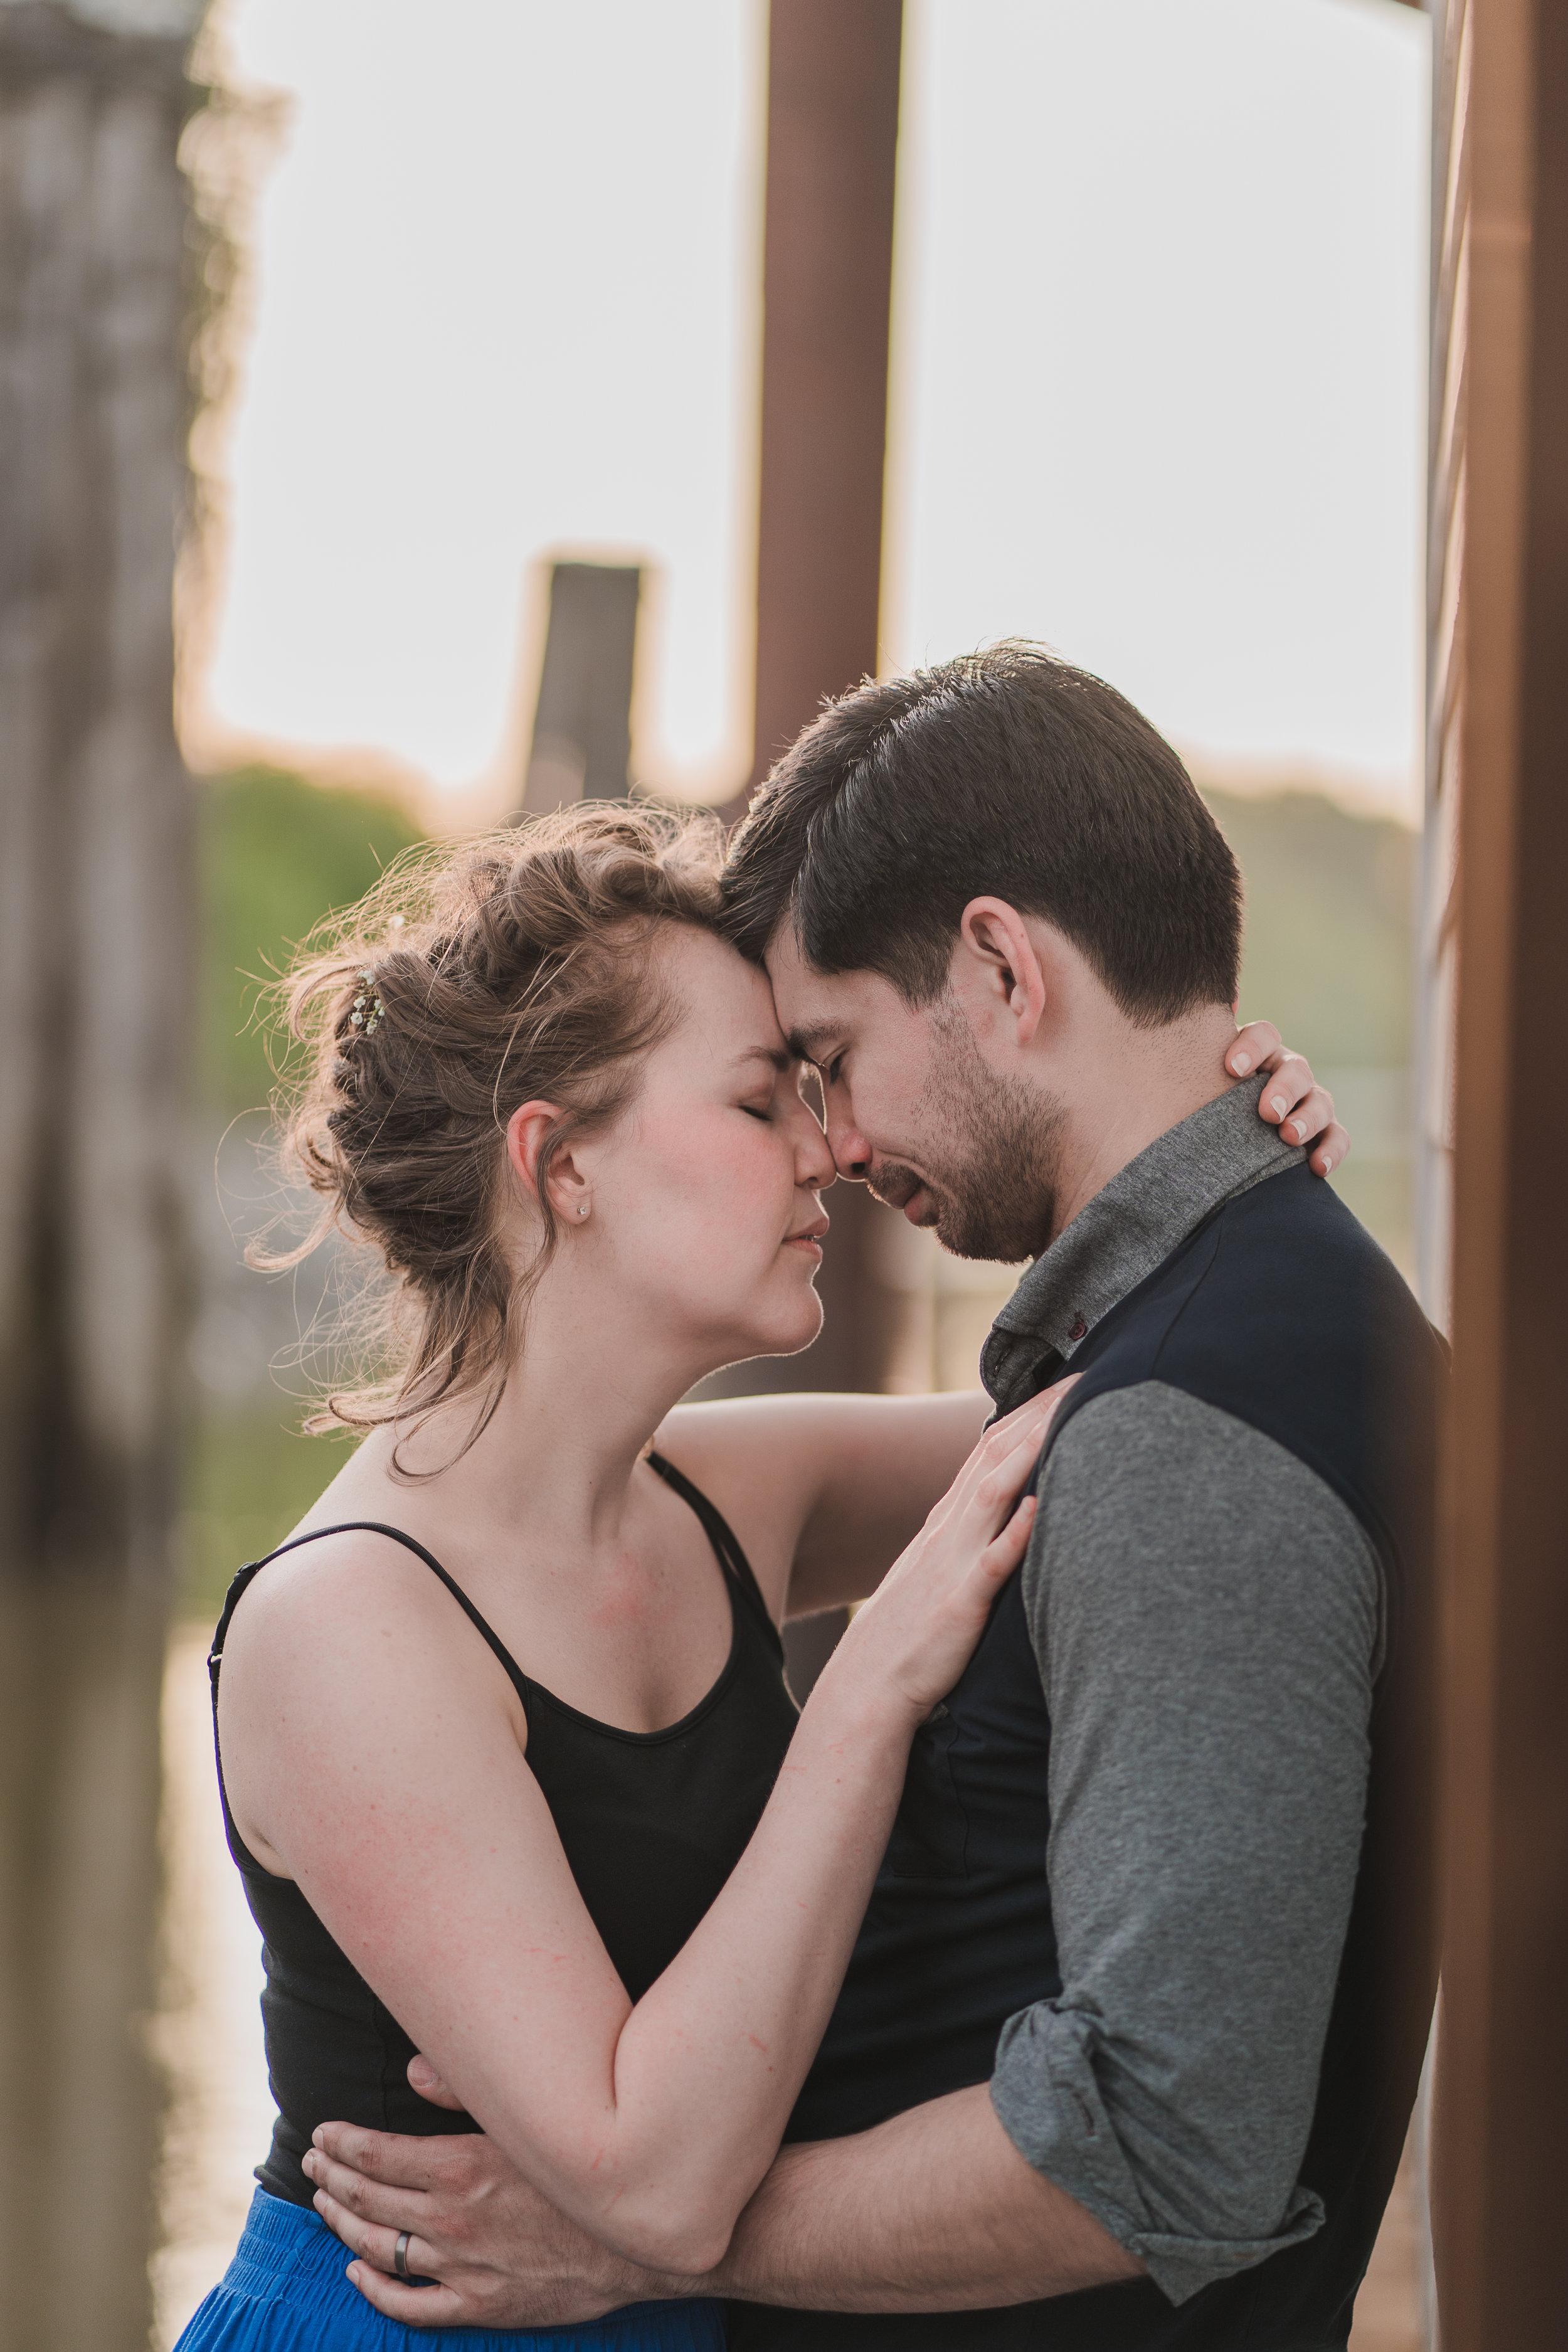 20190511 - Nicola & James Engagement - 0073.jpg